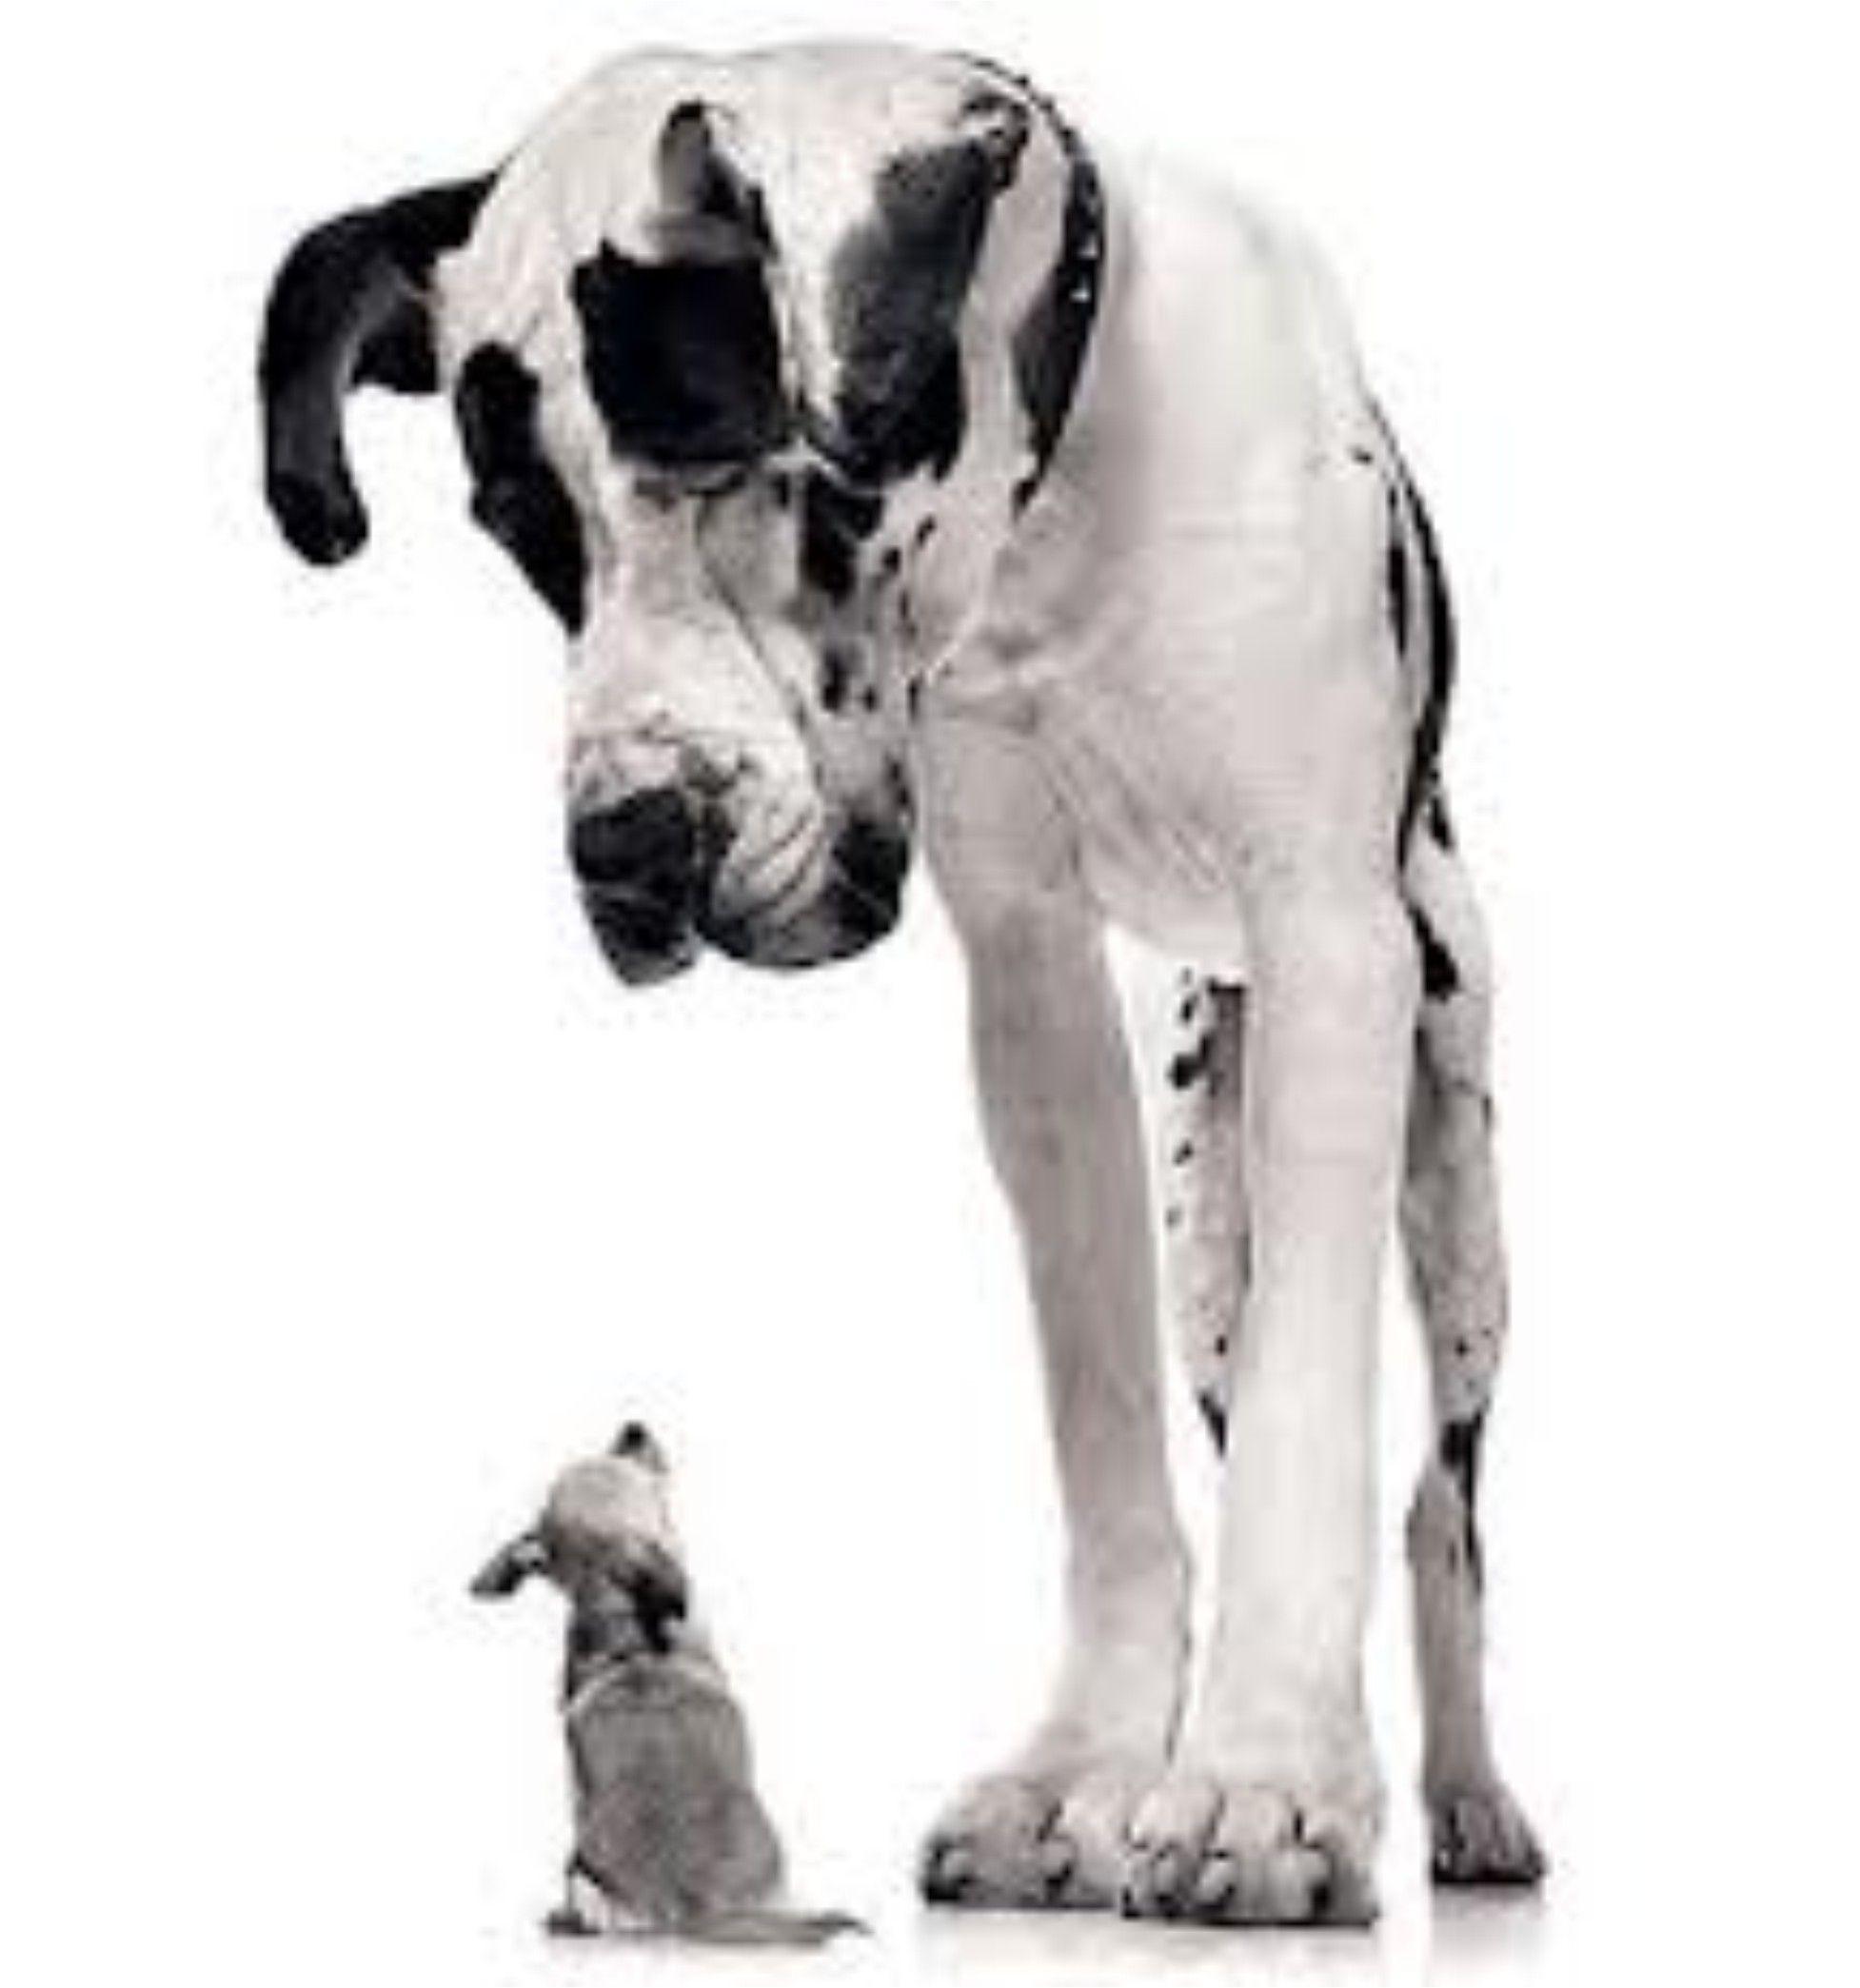 So Big So Small Animals Beautiful Big Dogs Animal Photography